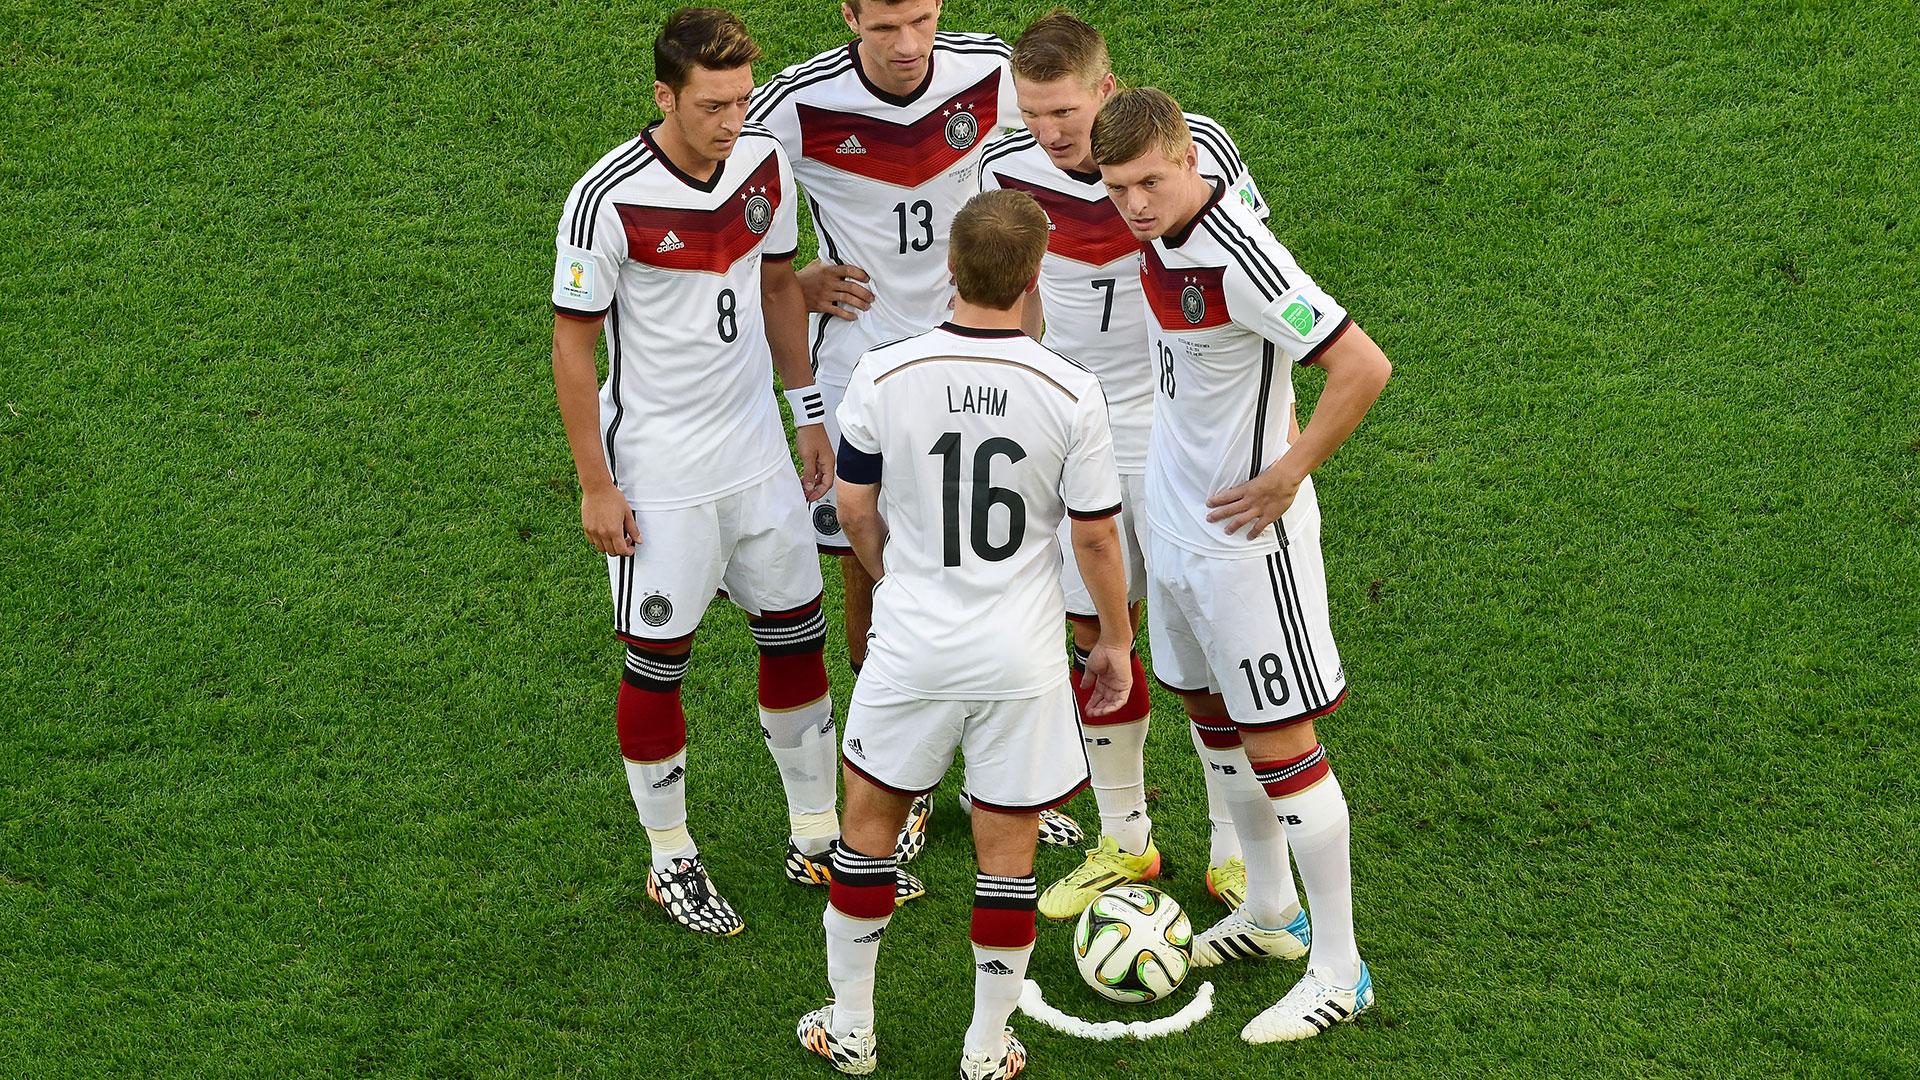 Philipp Lahm Germany 2014 World Cup